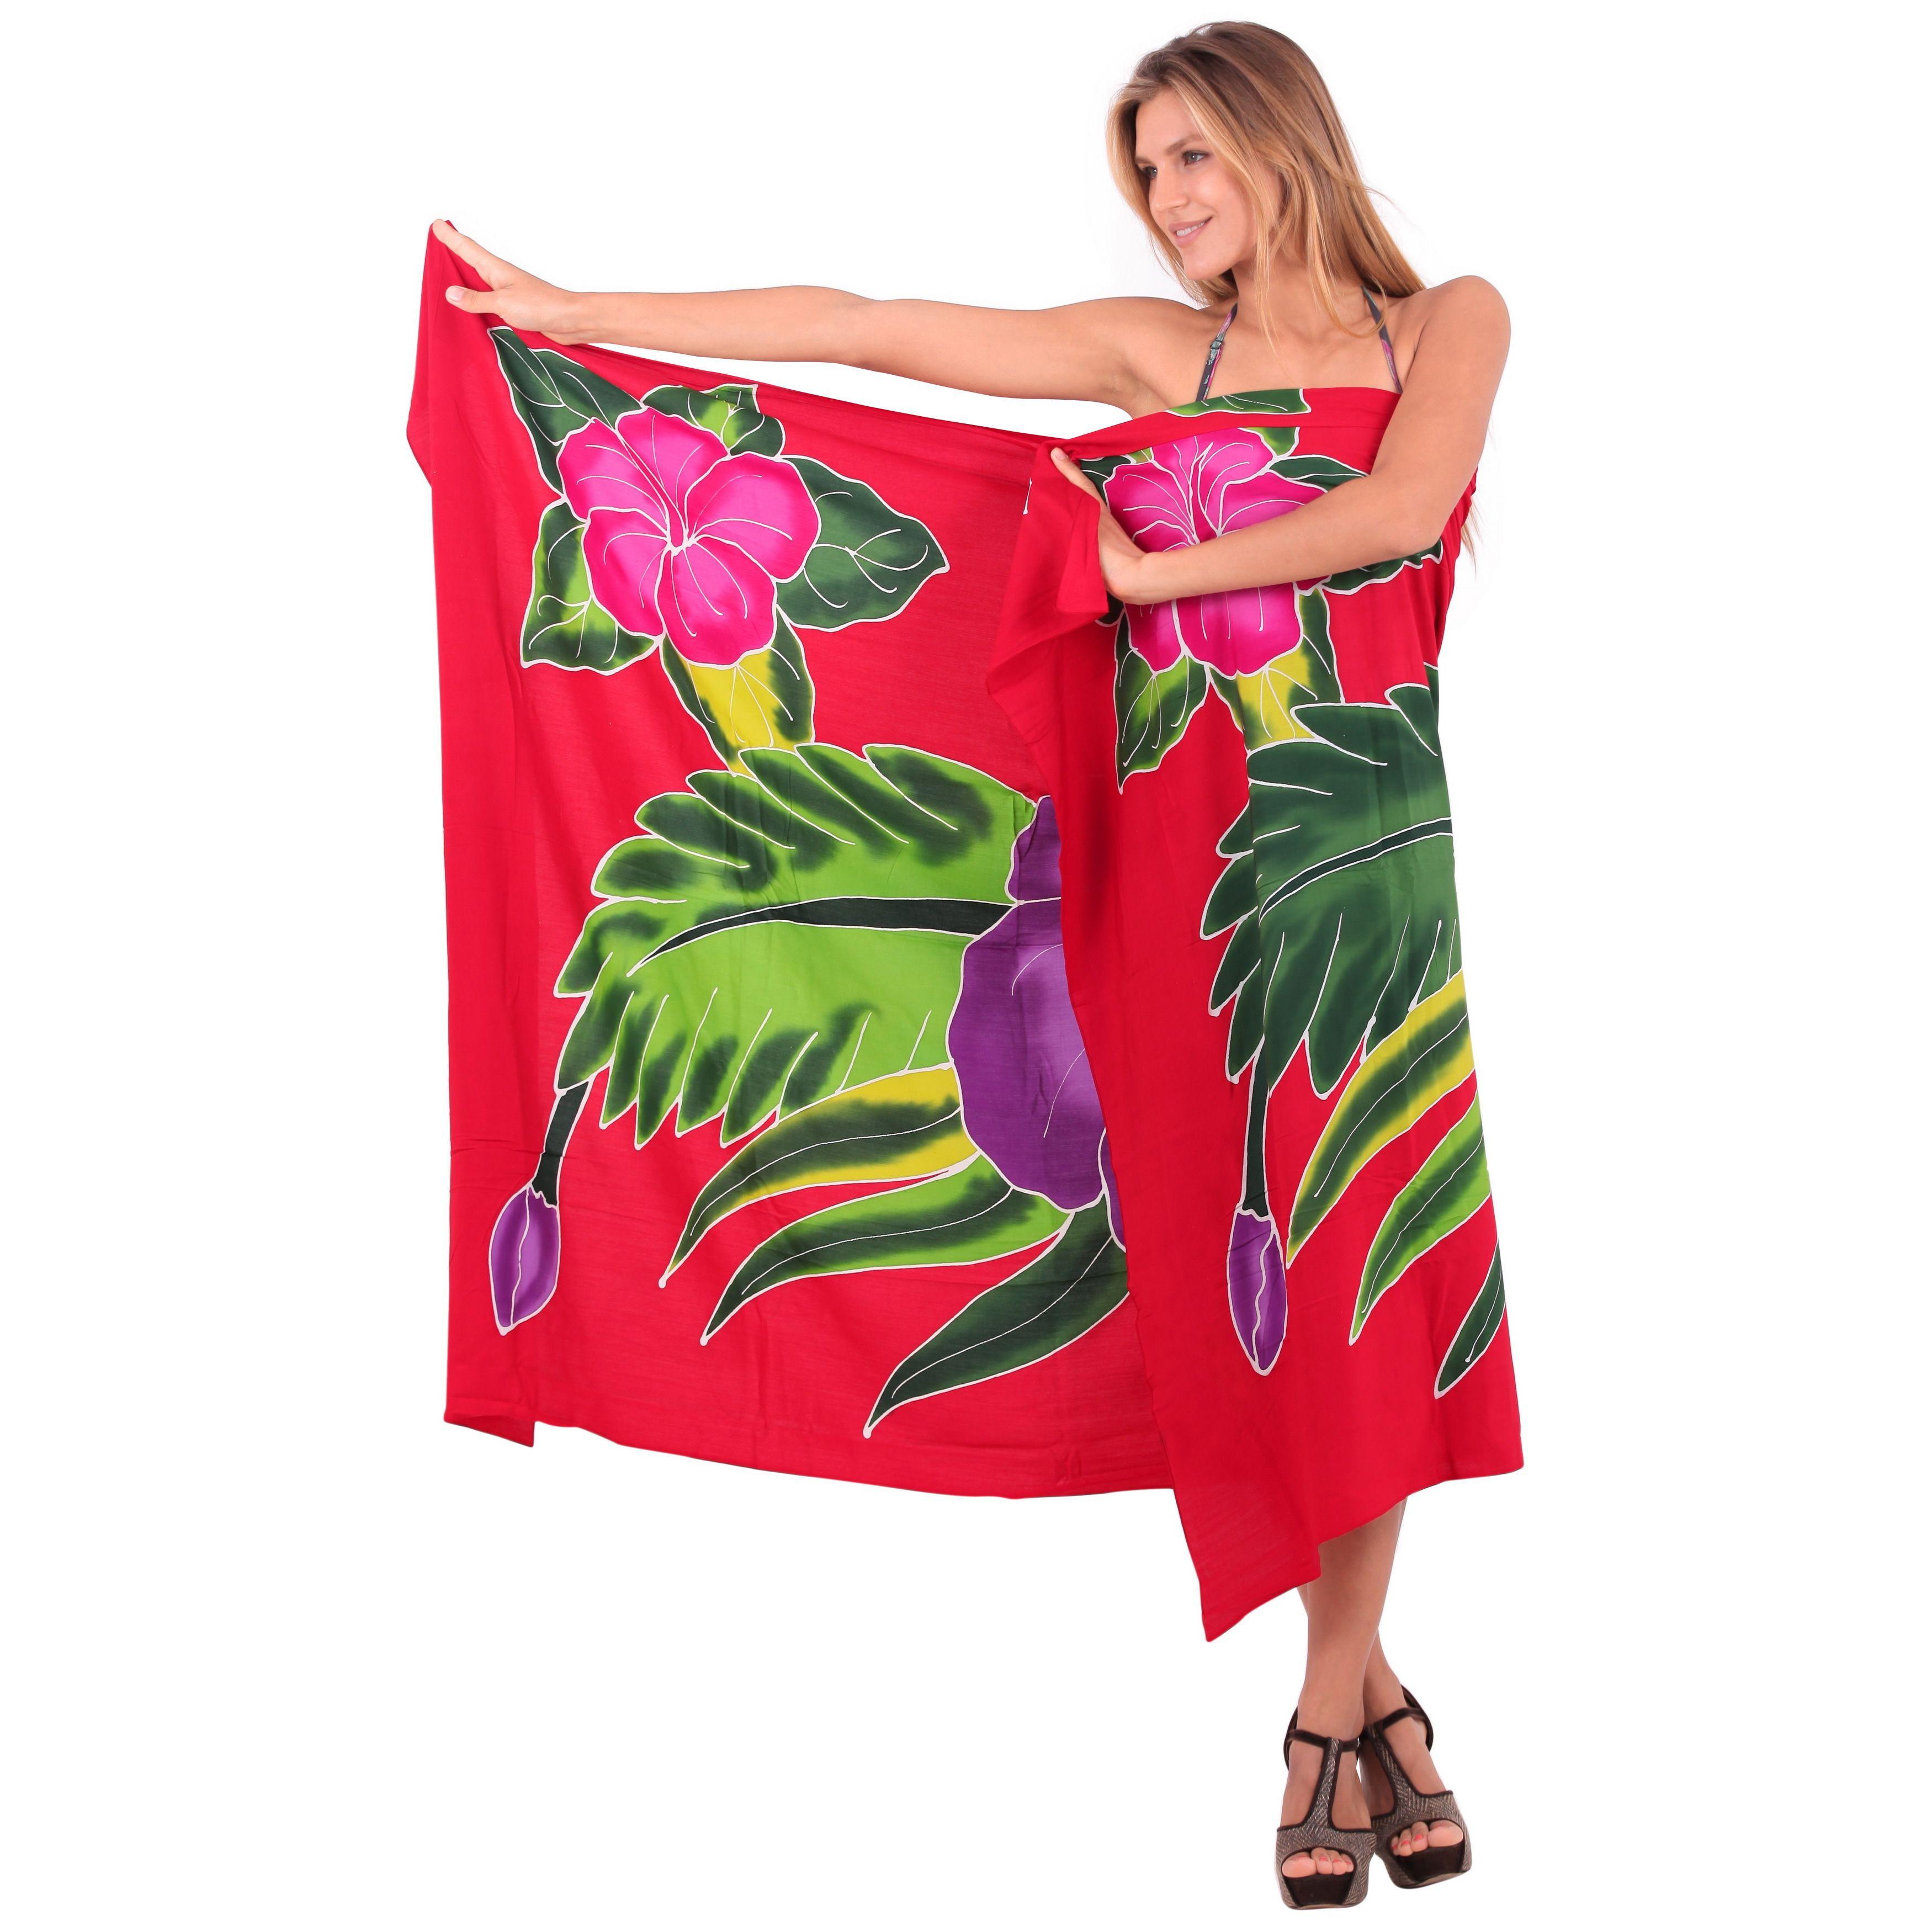 La Leela Women's 78-inch x 43-inch Pareo Beach Coverup With Sarong Clip